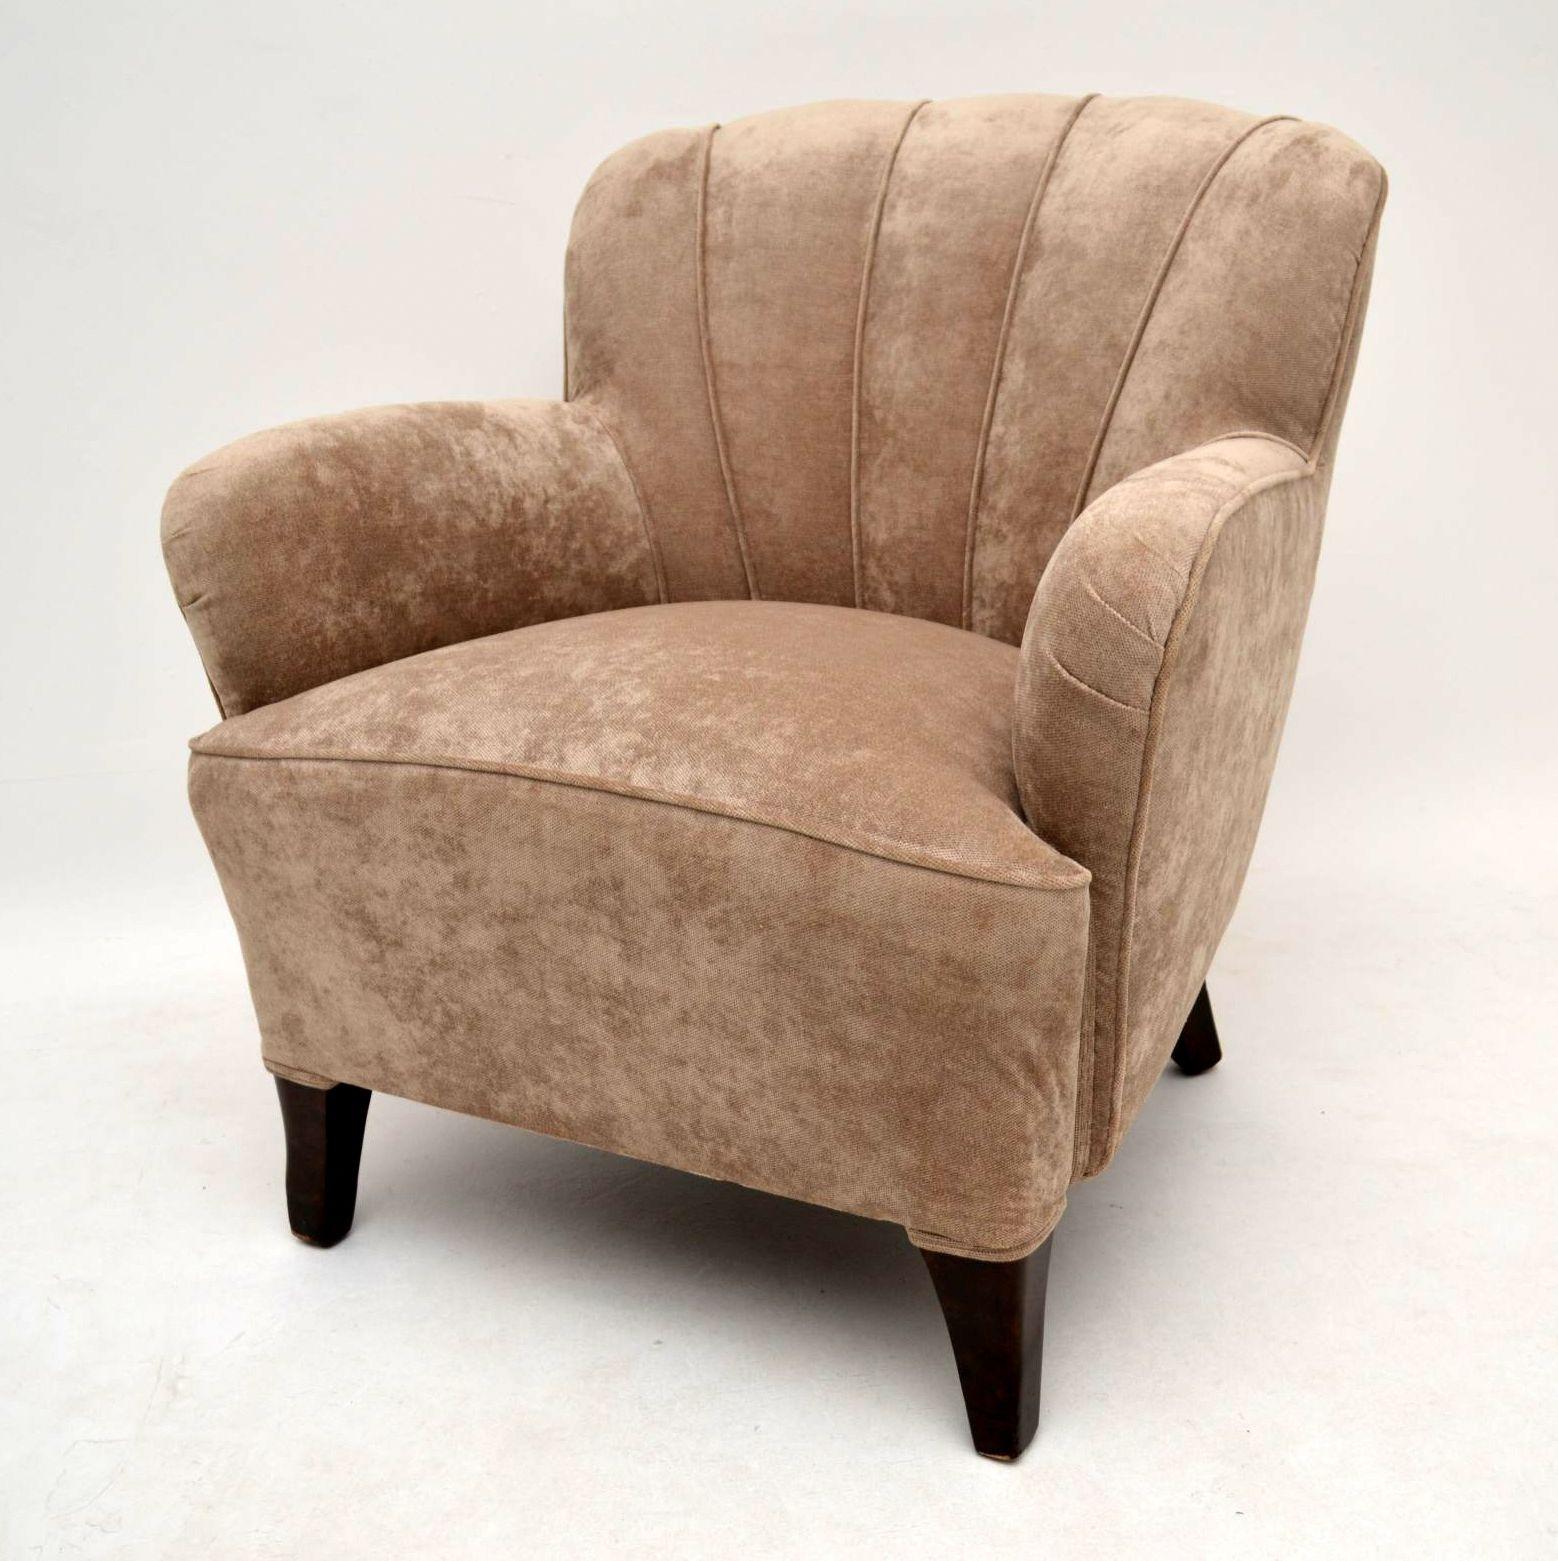 paar art deco schwedische scallop sessel fernsehsessel. Black Bedroom Furniture Sets. Home Design Ideas